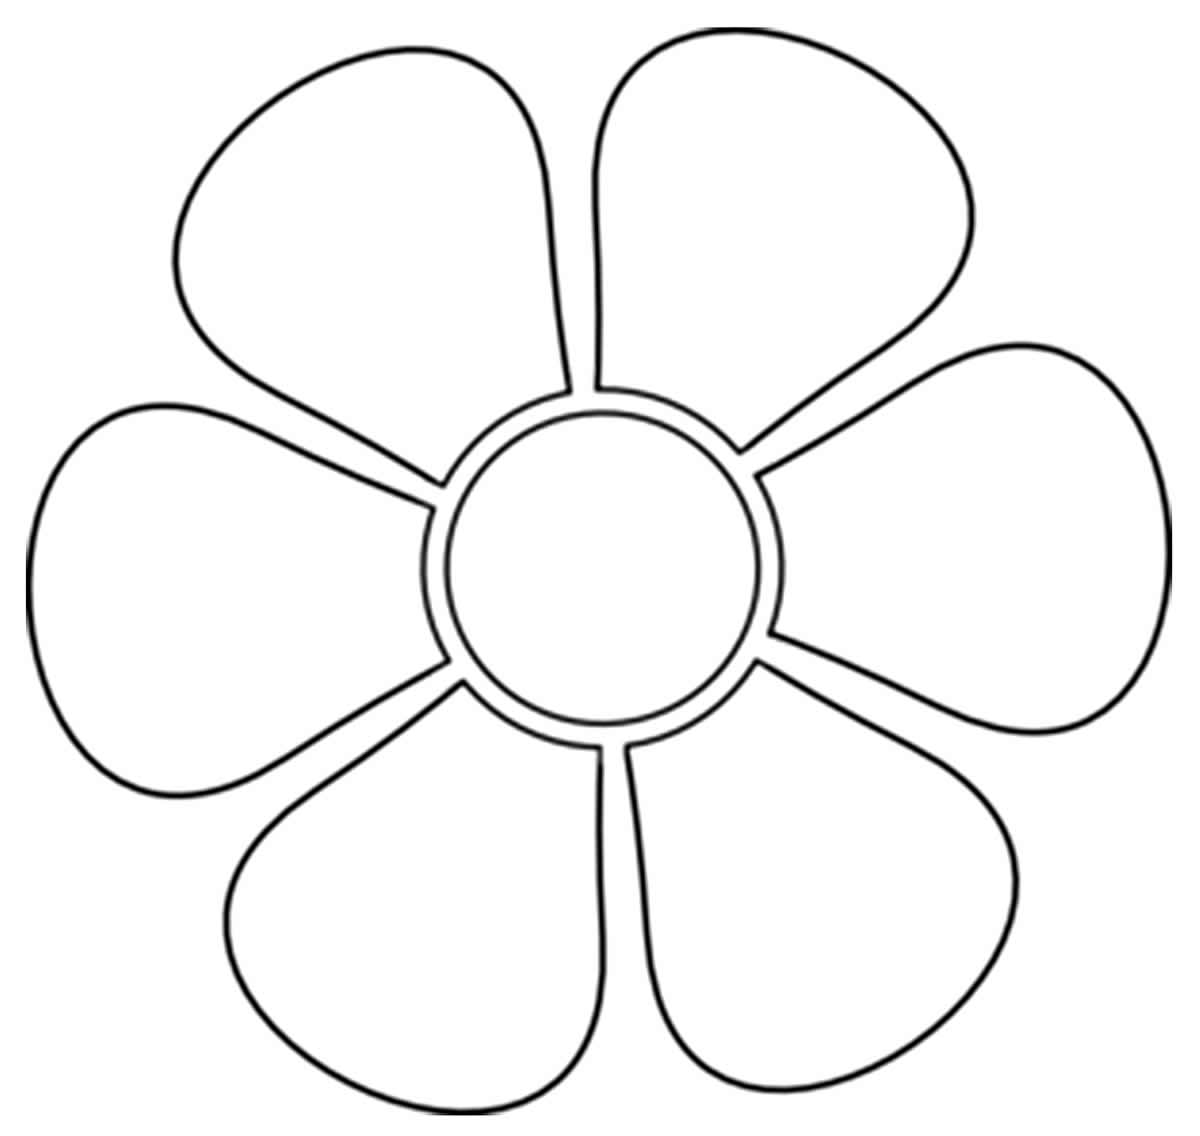 Molde de pétala de flor